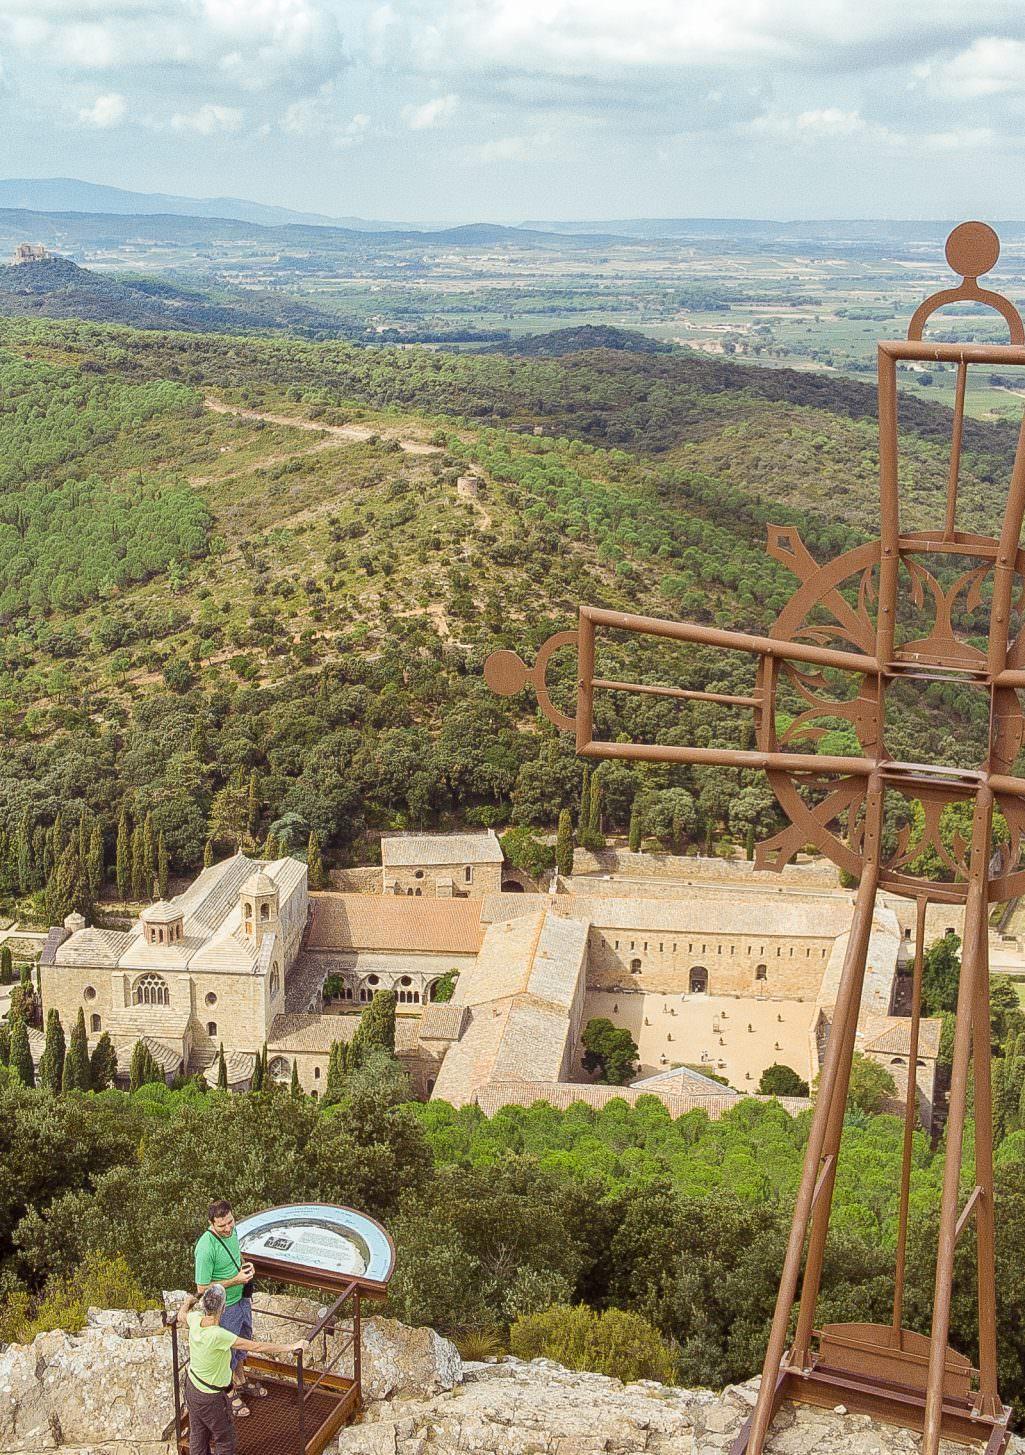 Narbonne, abbaye de fontfroide et massif ©Rogier Fackeldey-Abbaye de Fontfroide